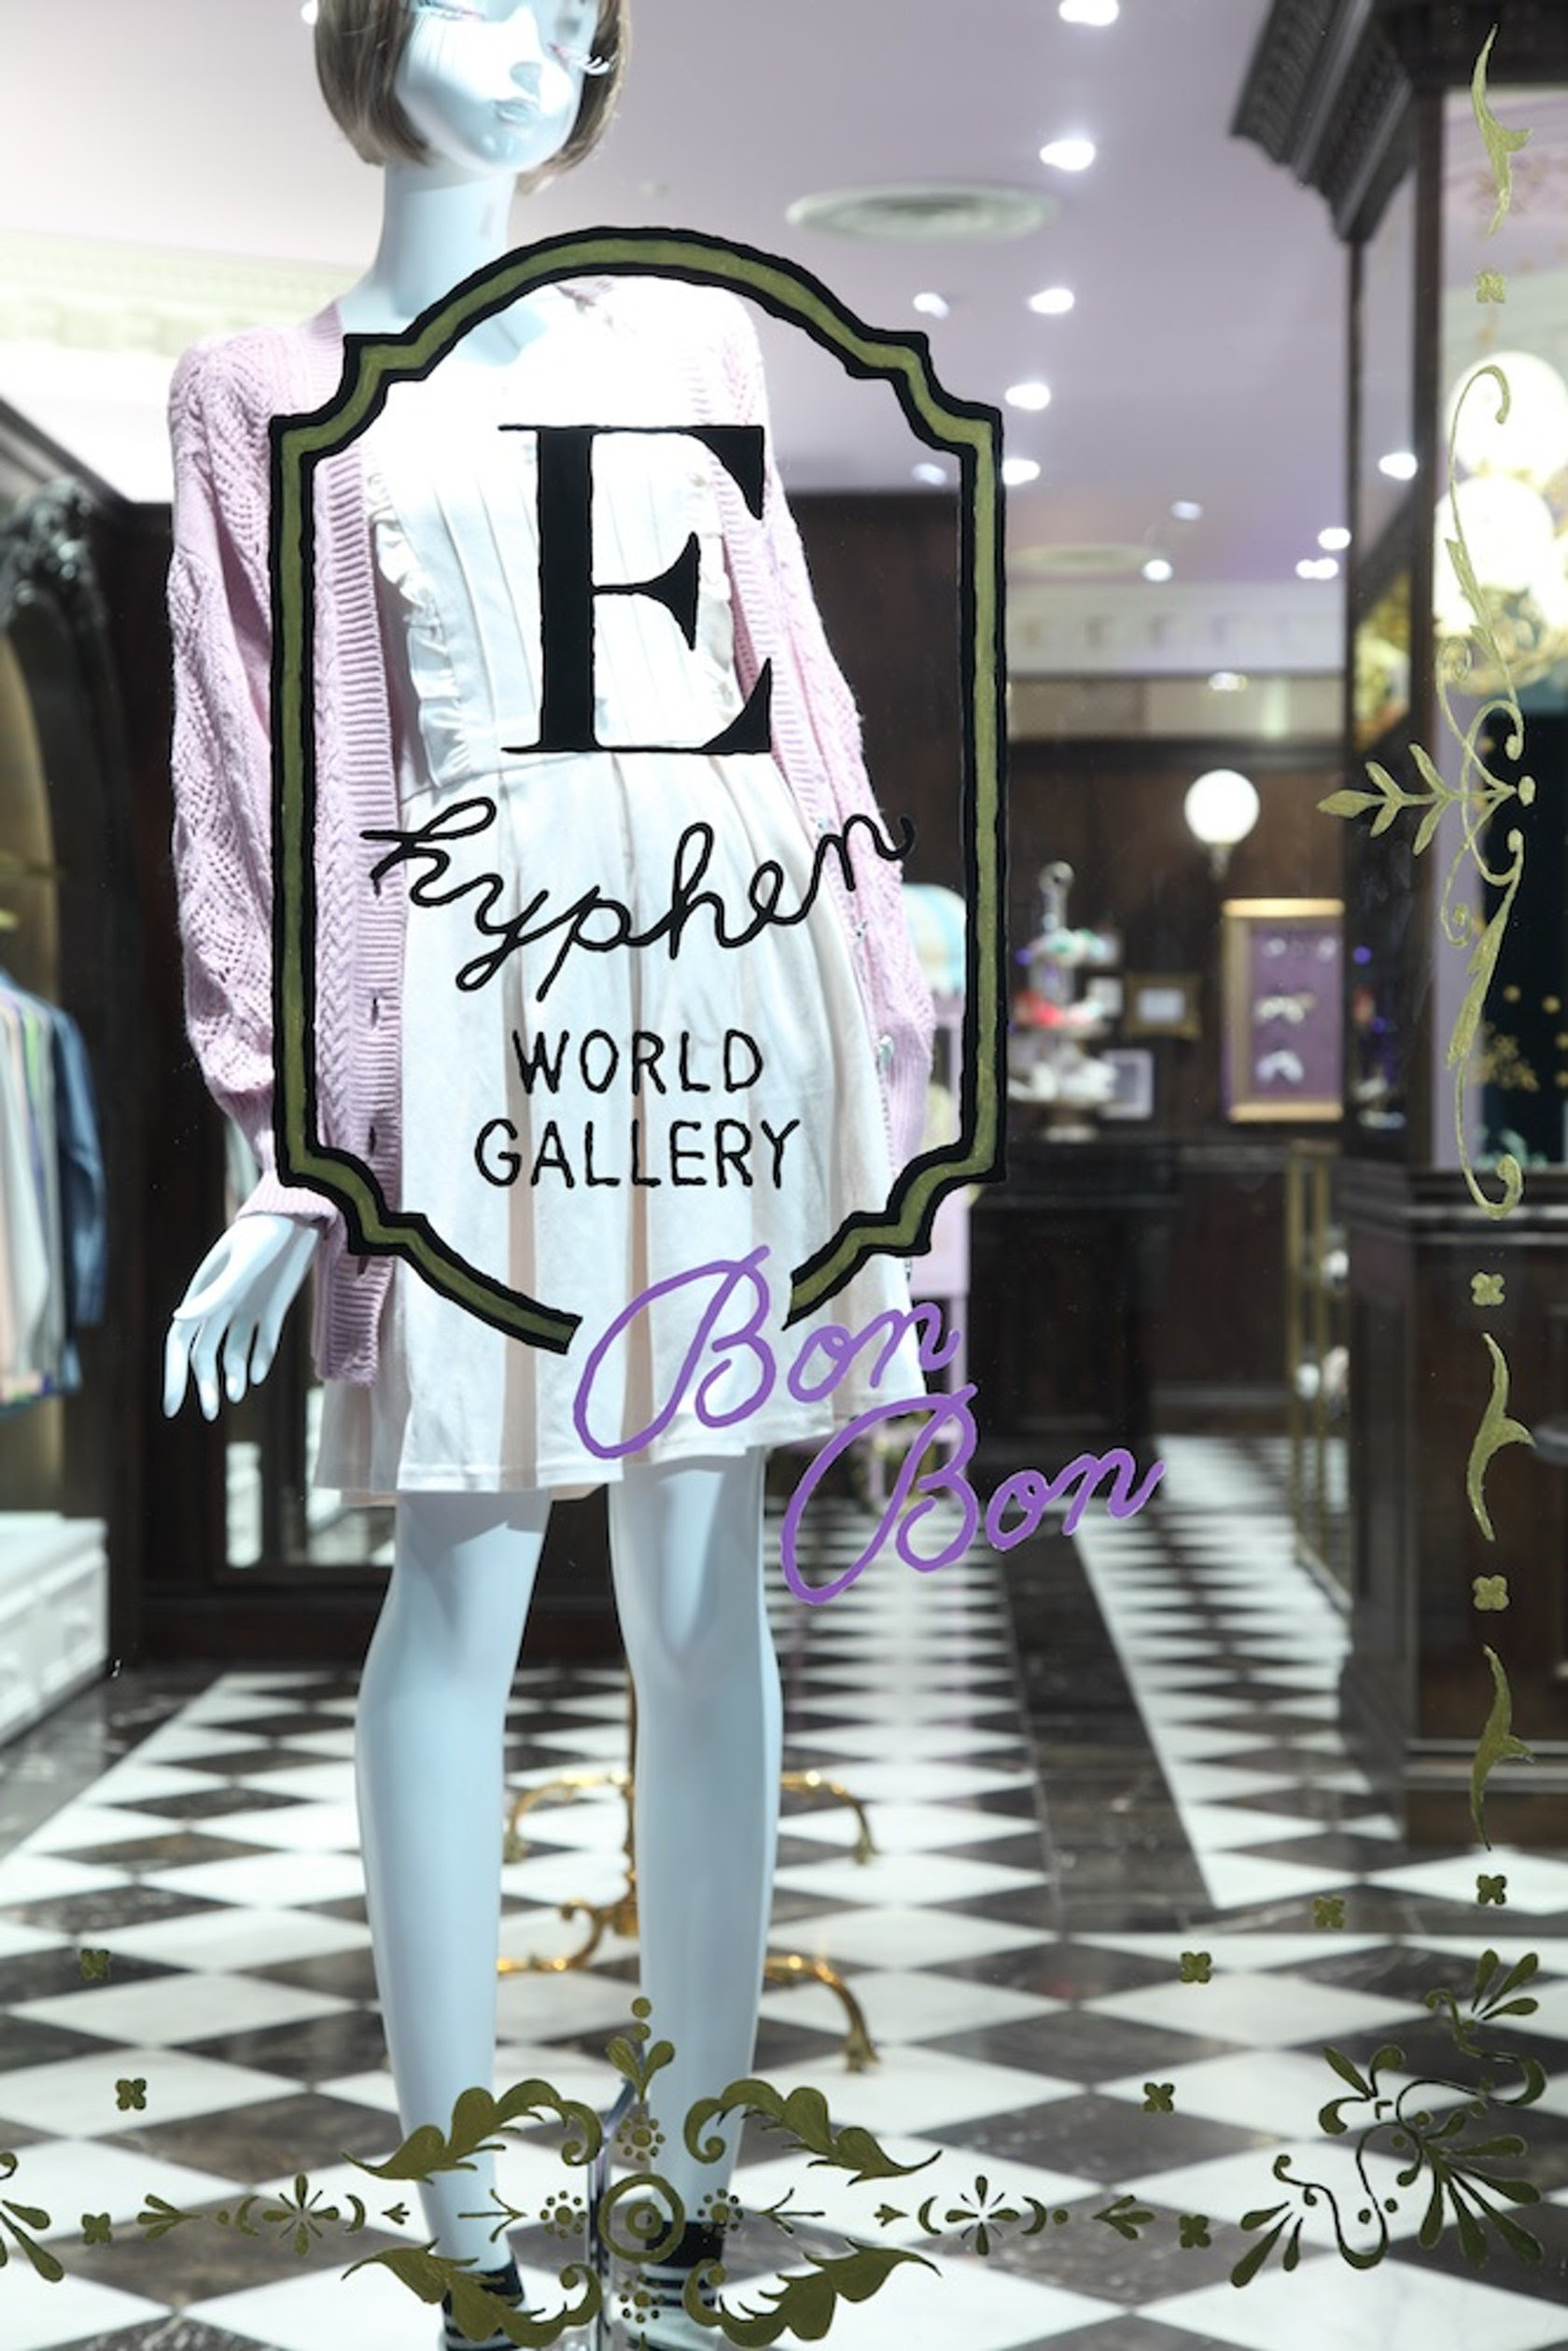 Resultado de imagen para E hyphen world gallery BonBon laforet